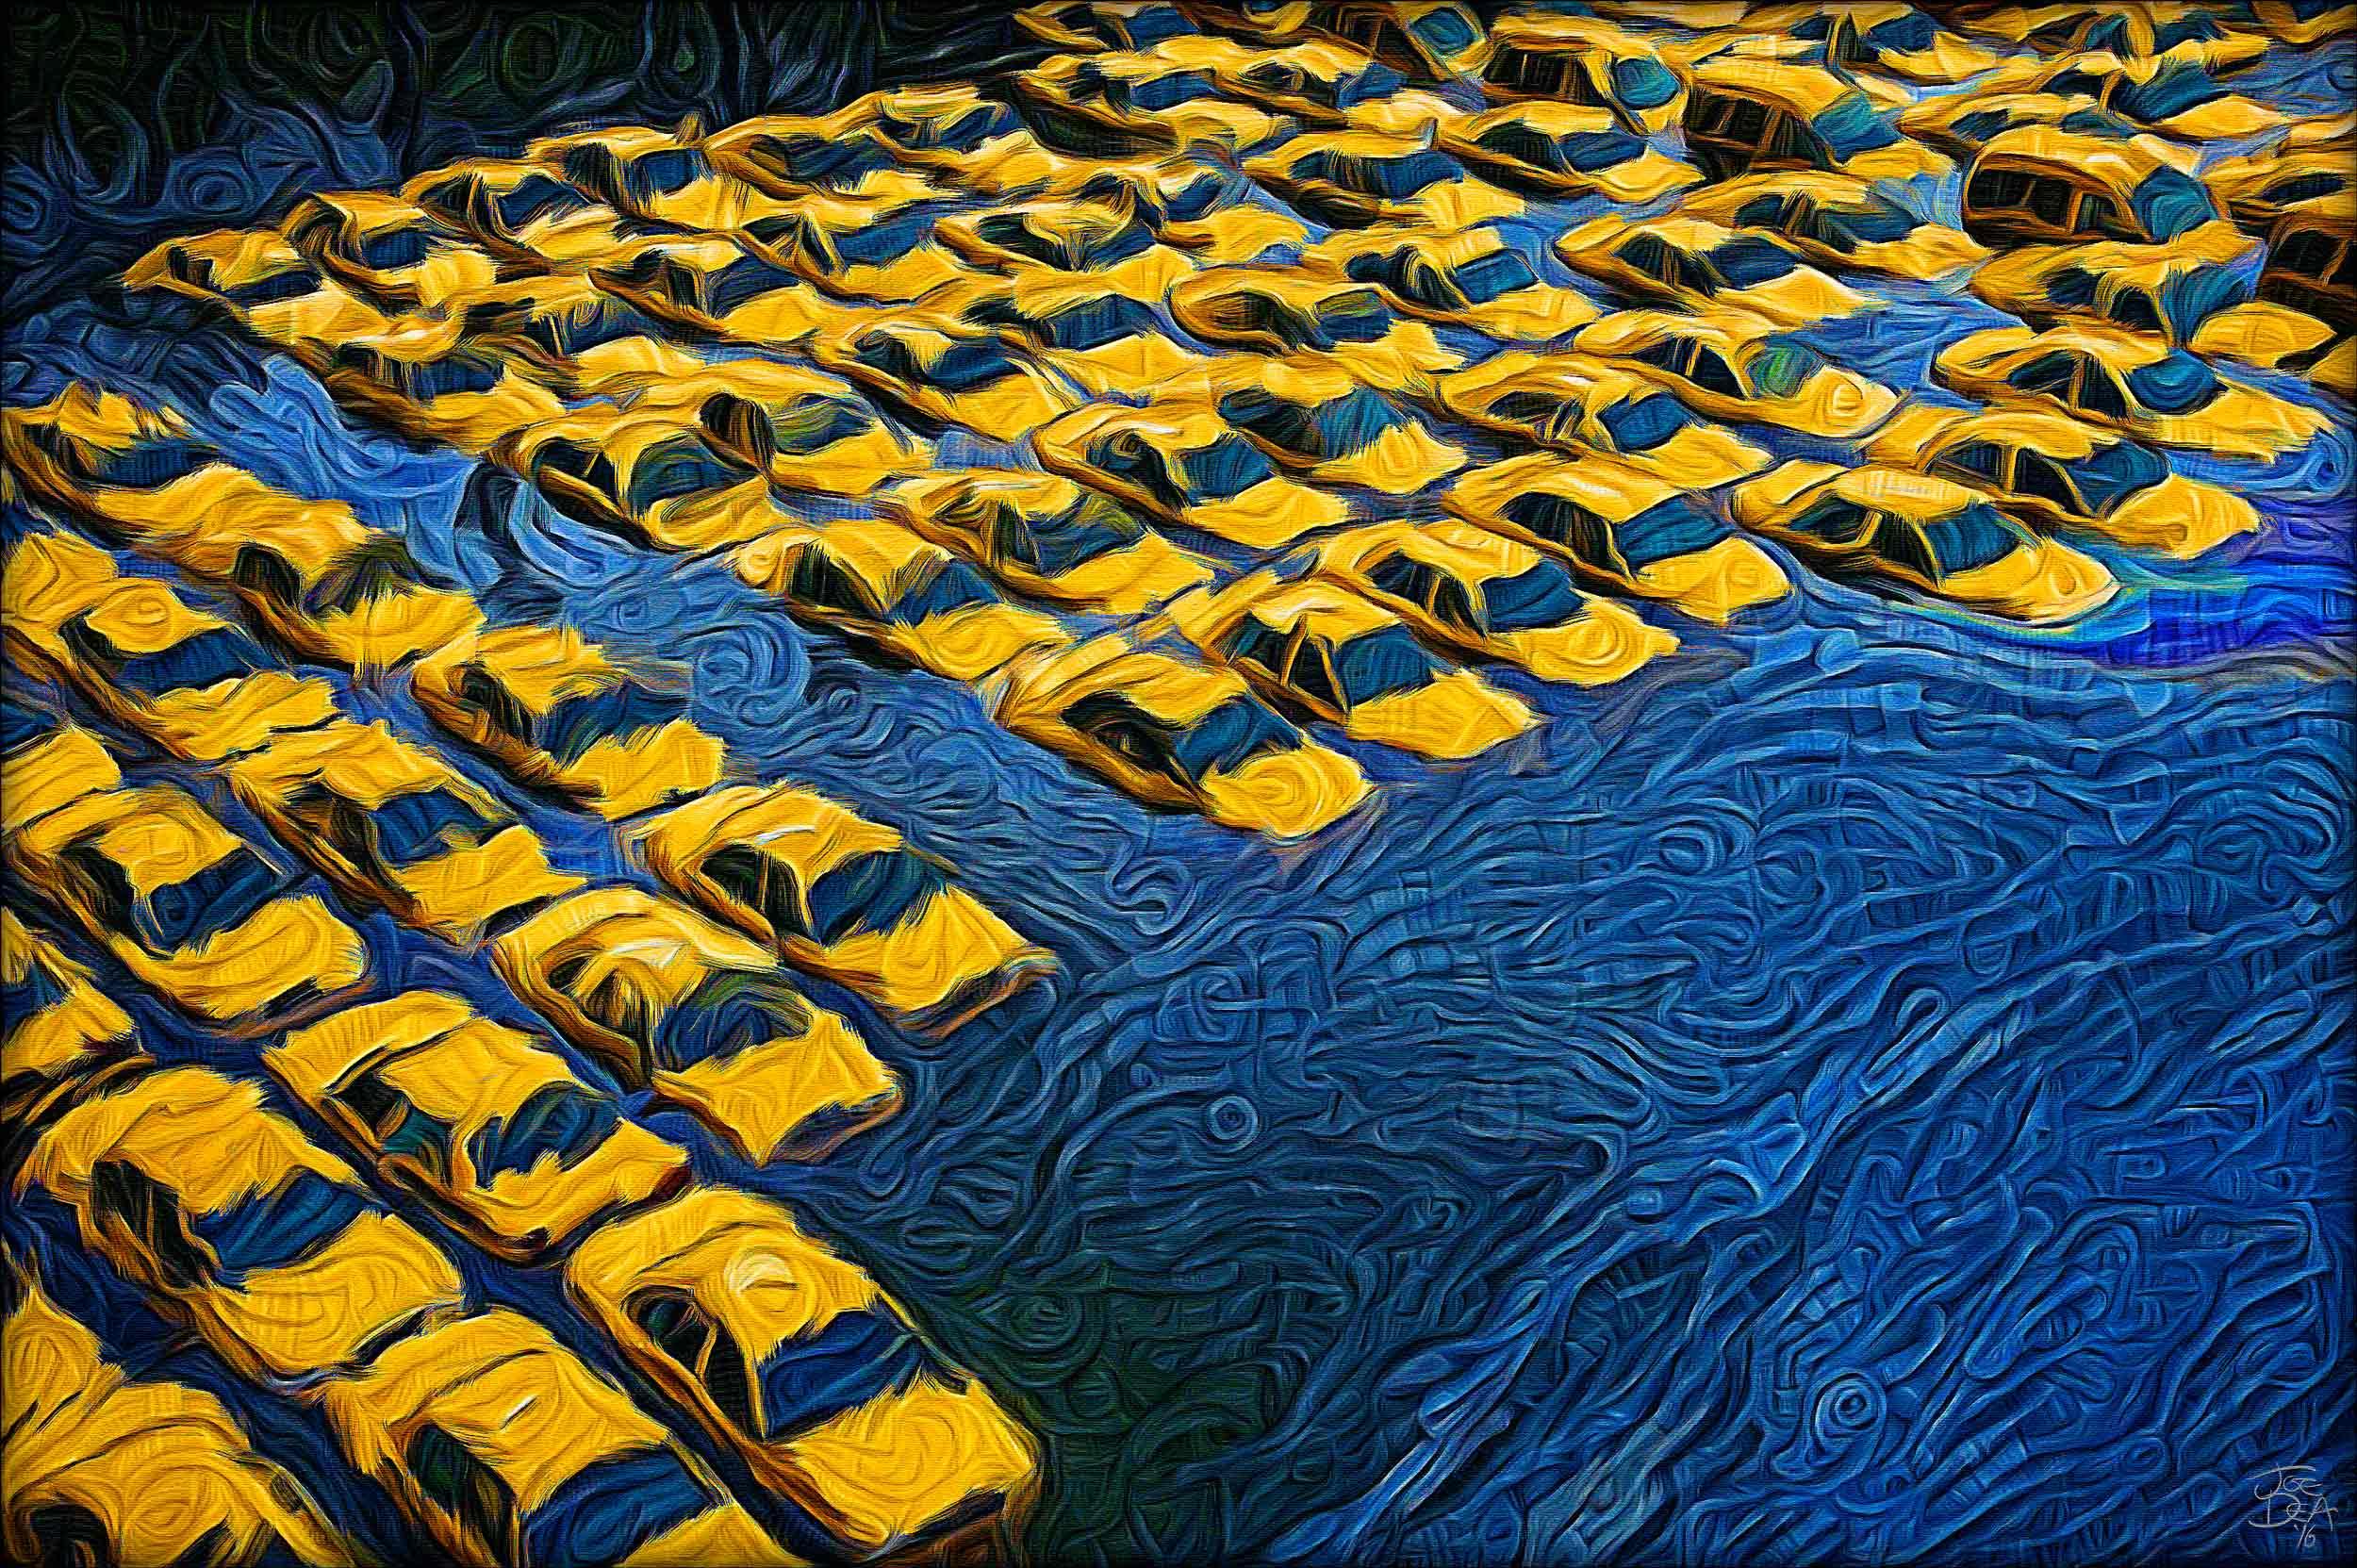 Joe-Dea-Sandy-Taxis-Submerged-Painting-LB.jpg